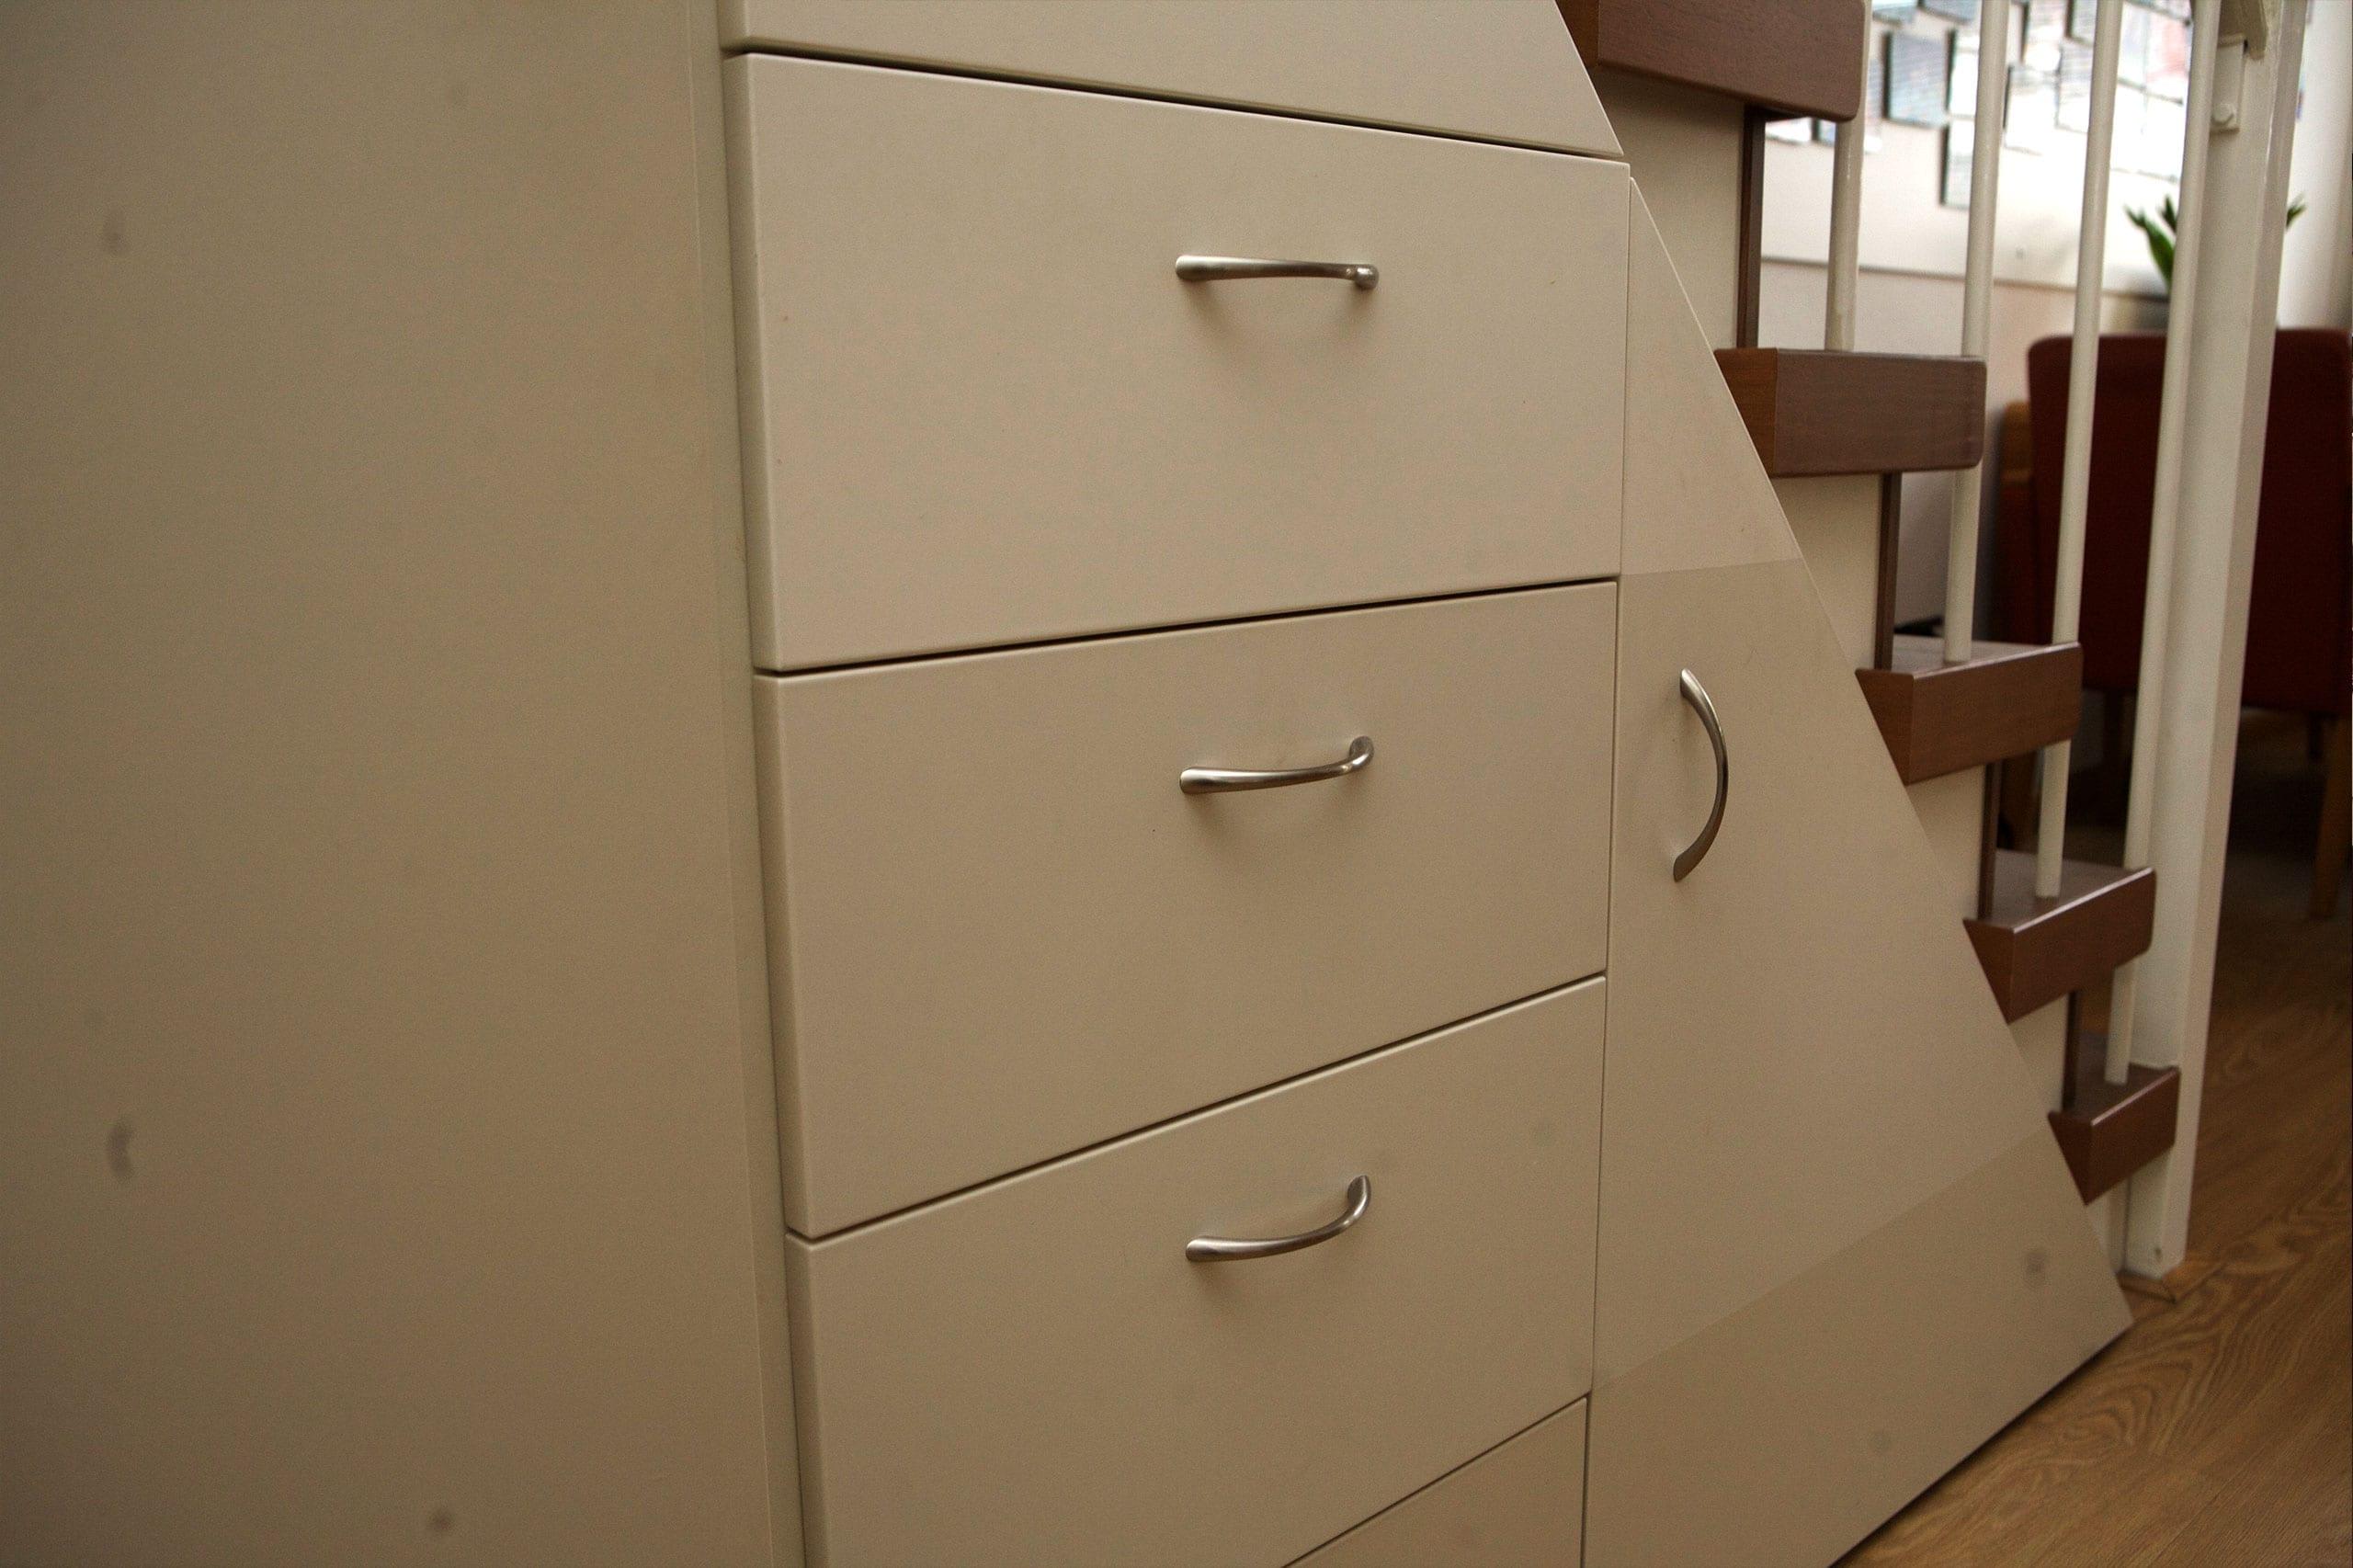 trapkast-ontwerp-op-maat-3